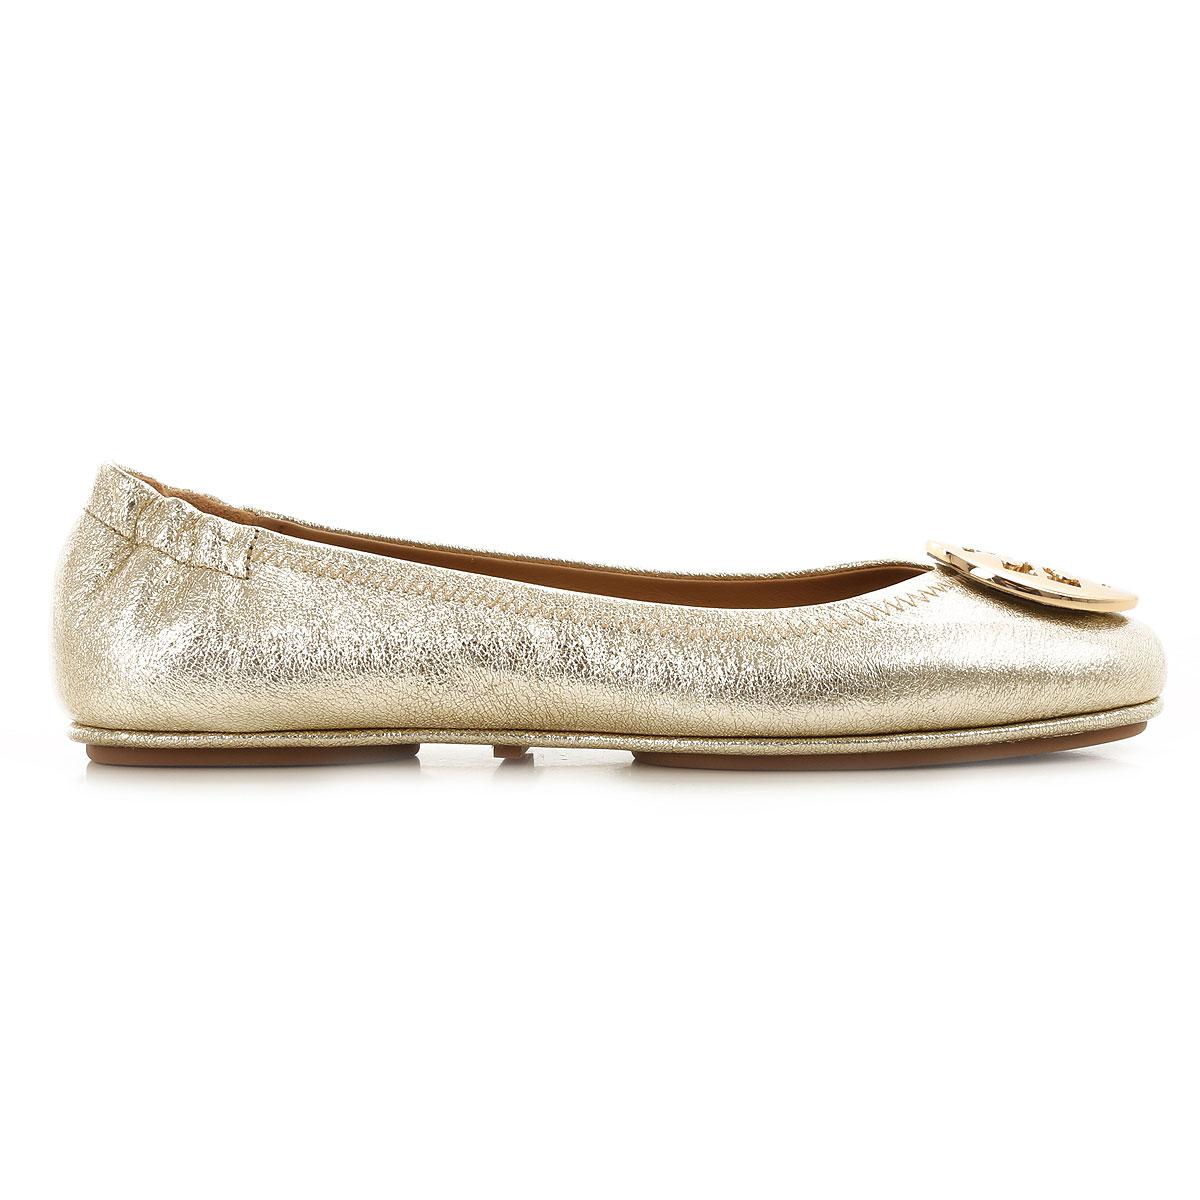 85aedf1e573c Tory Burch - Metallic Ballet Flats Ballerina Shoes For Women - Lyst. View  fullscreen